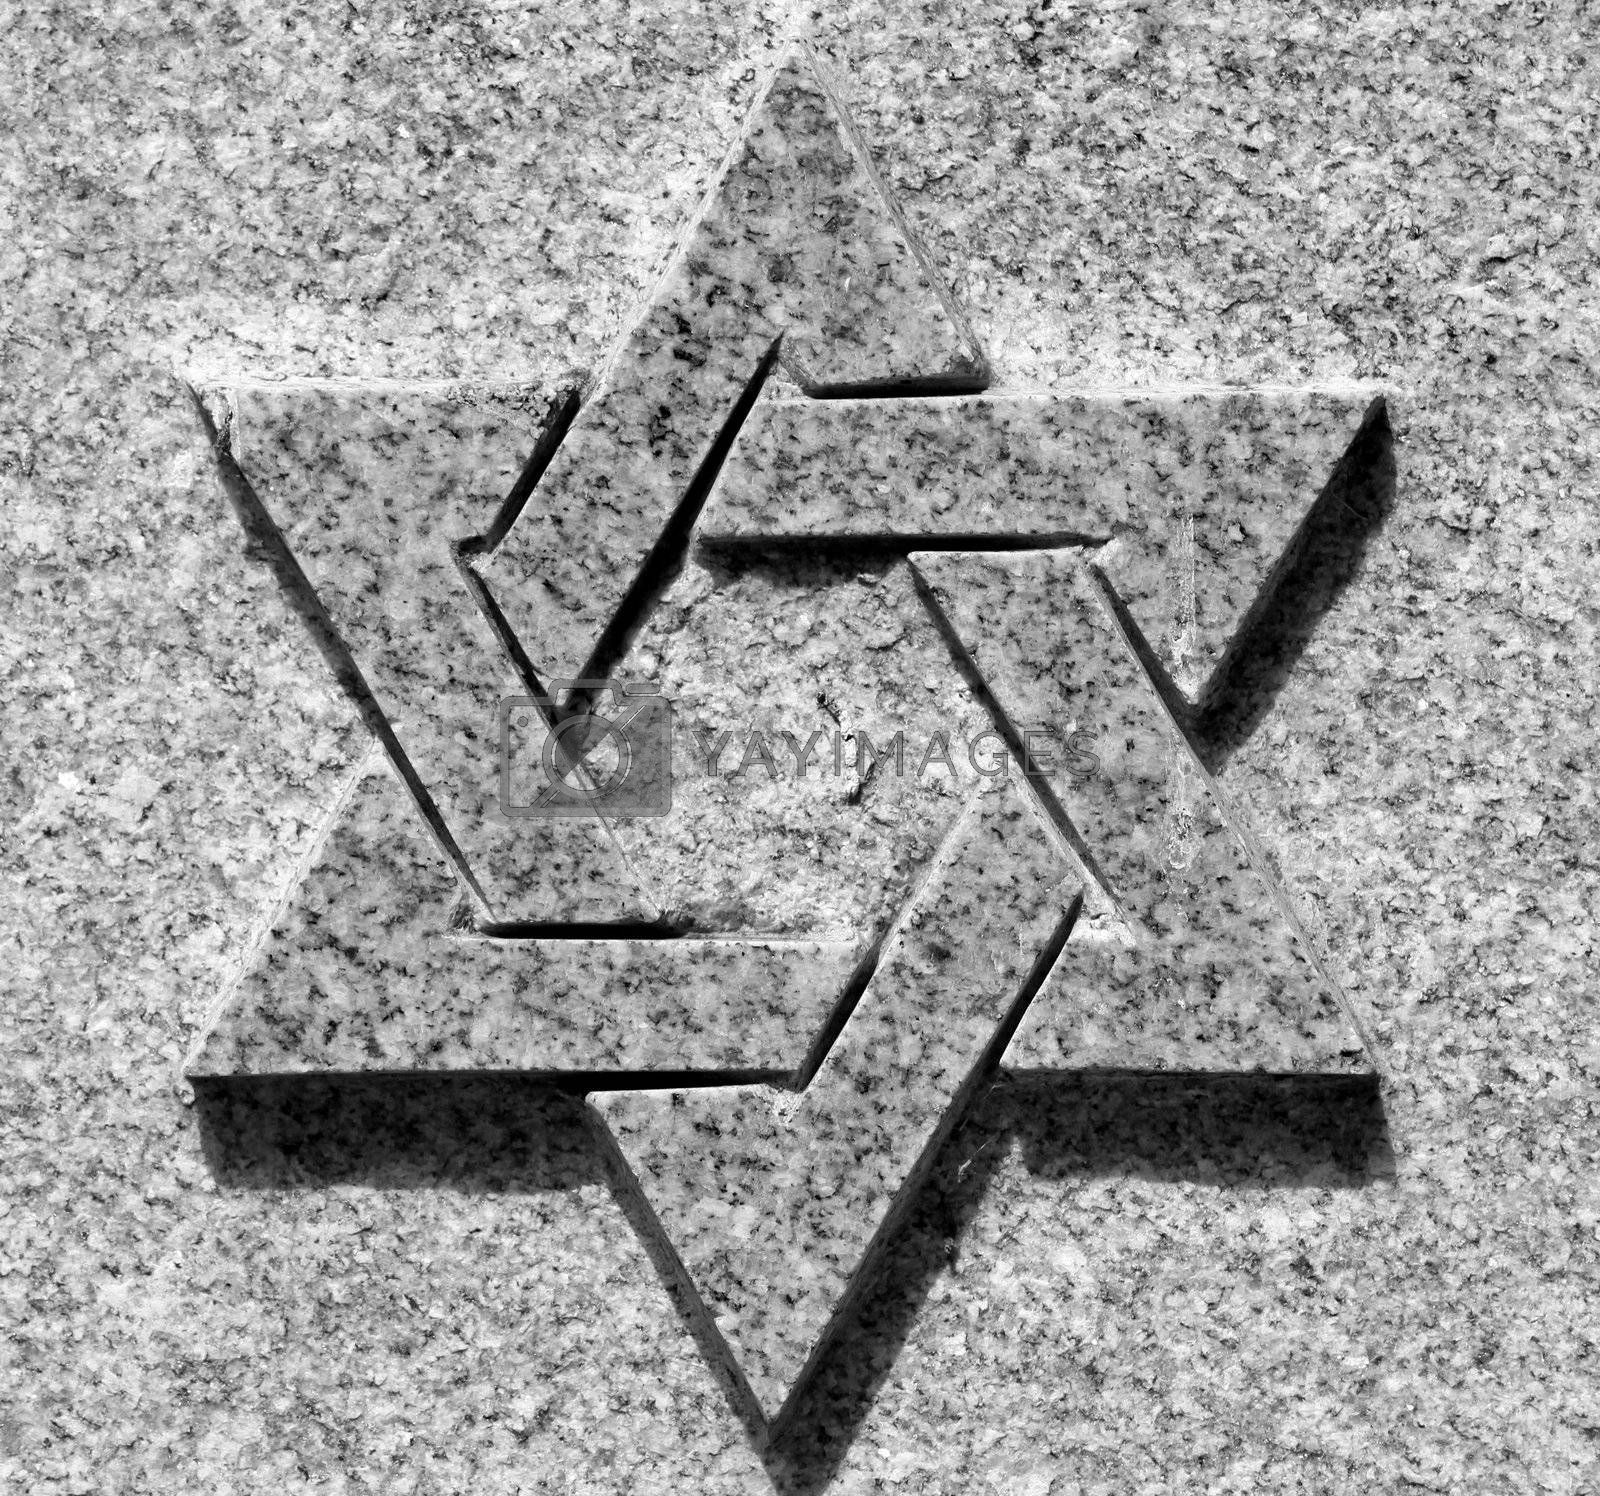 Star of David by Vaidas Bucys